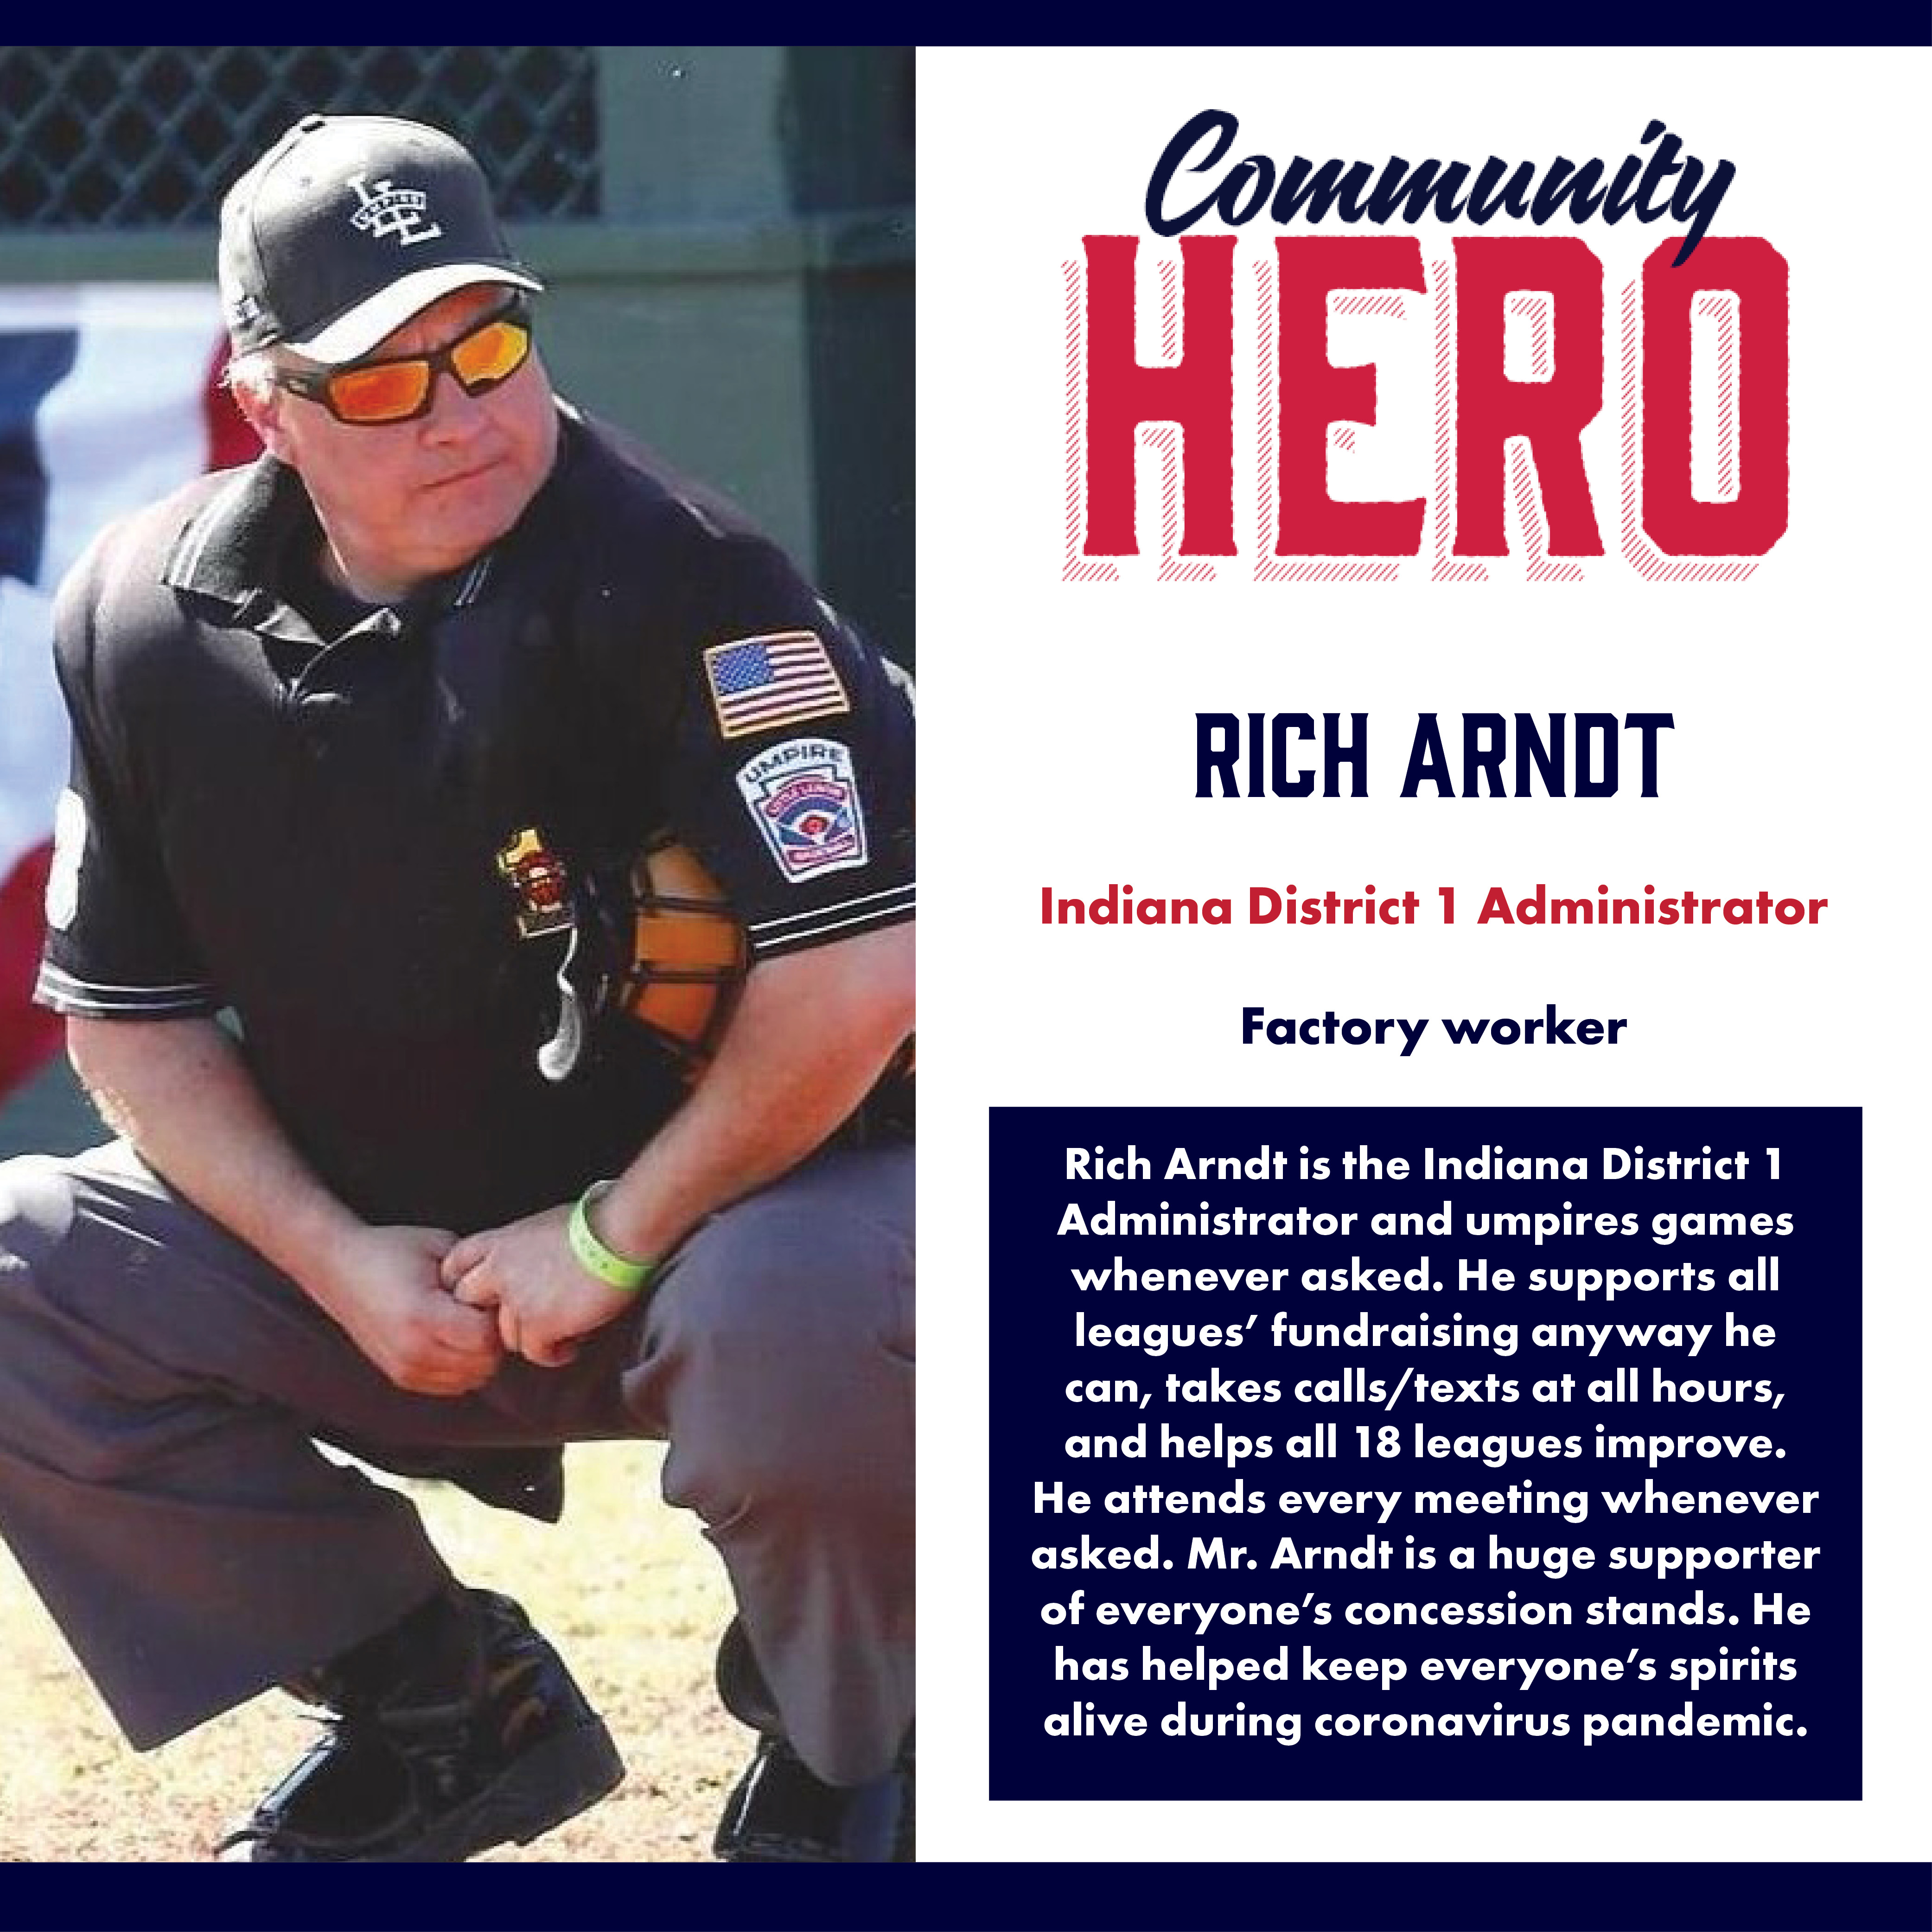 Rich Arndt Community Hero